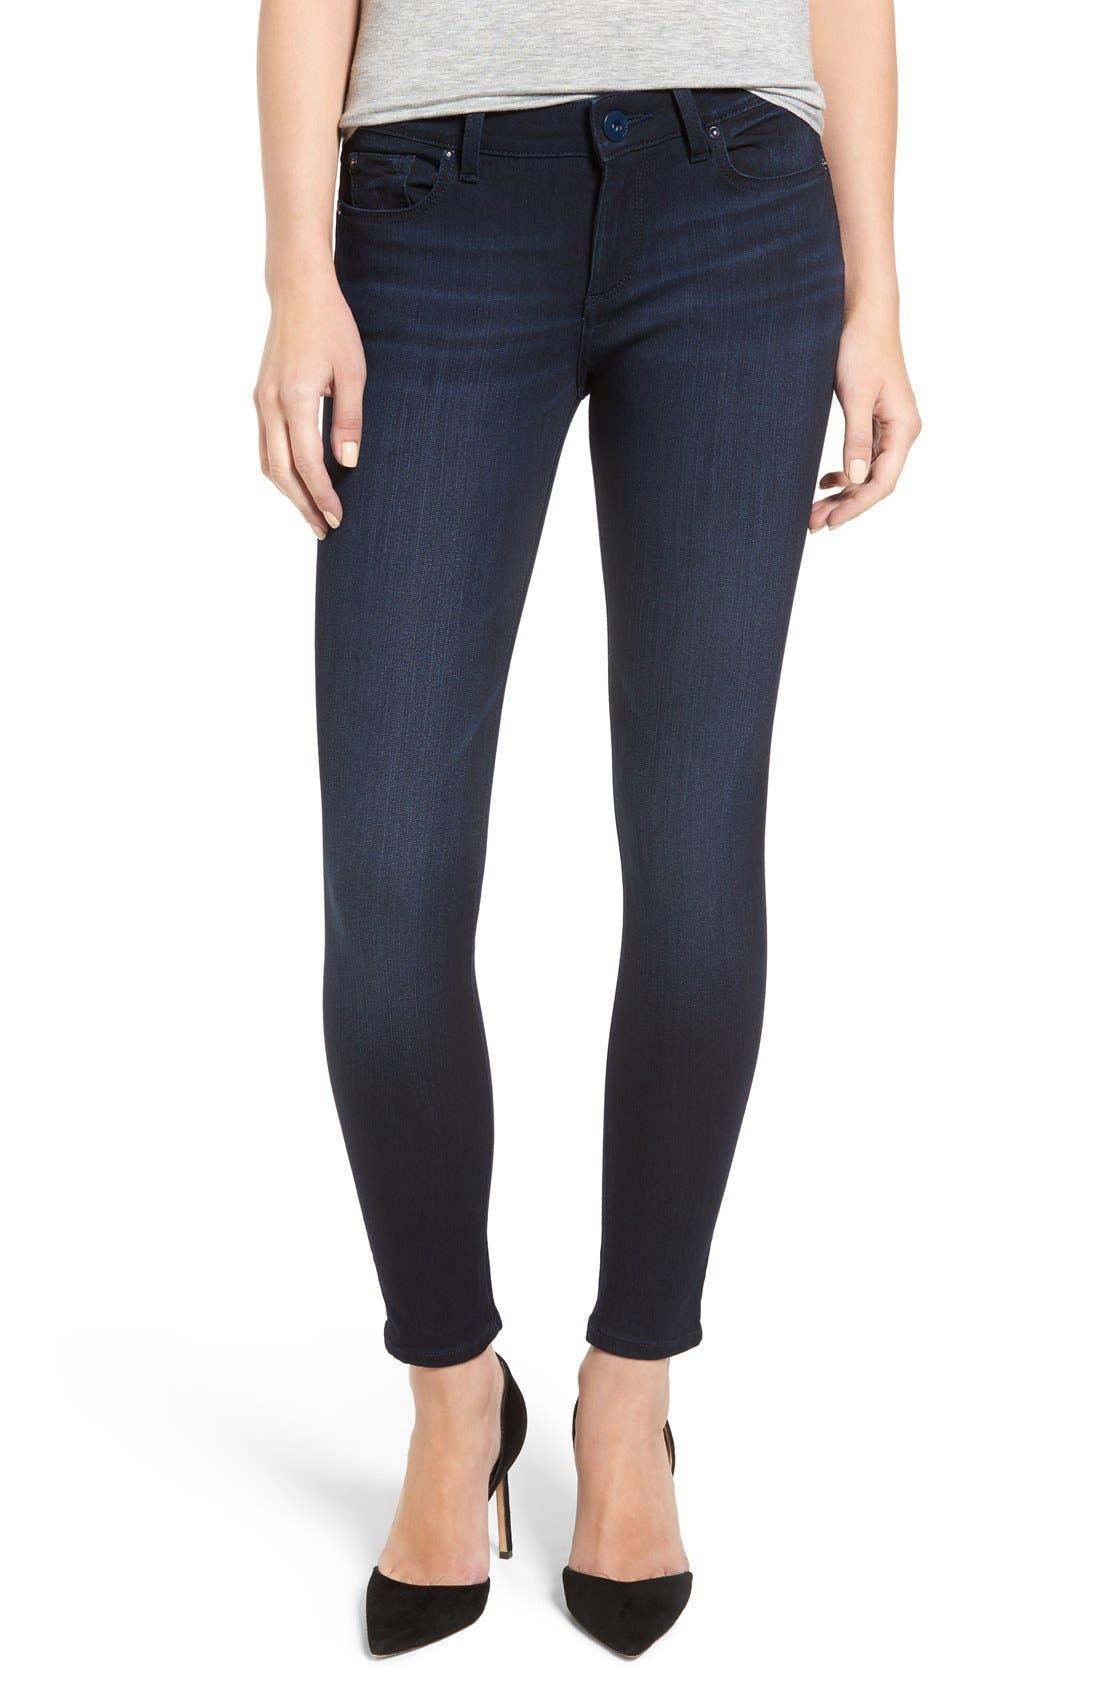 'Emma' Power Legging Jeans,                             Main thumbnail 1, color,                             405